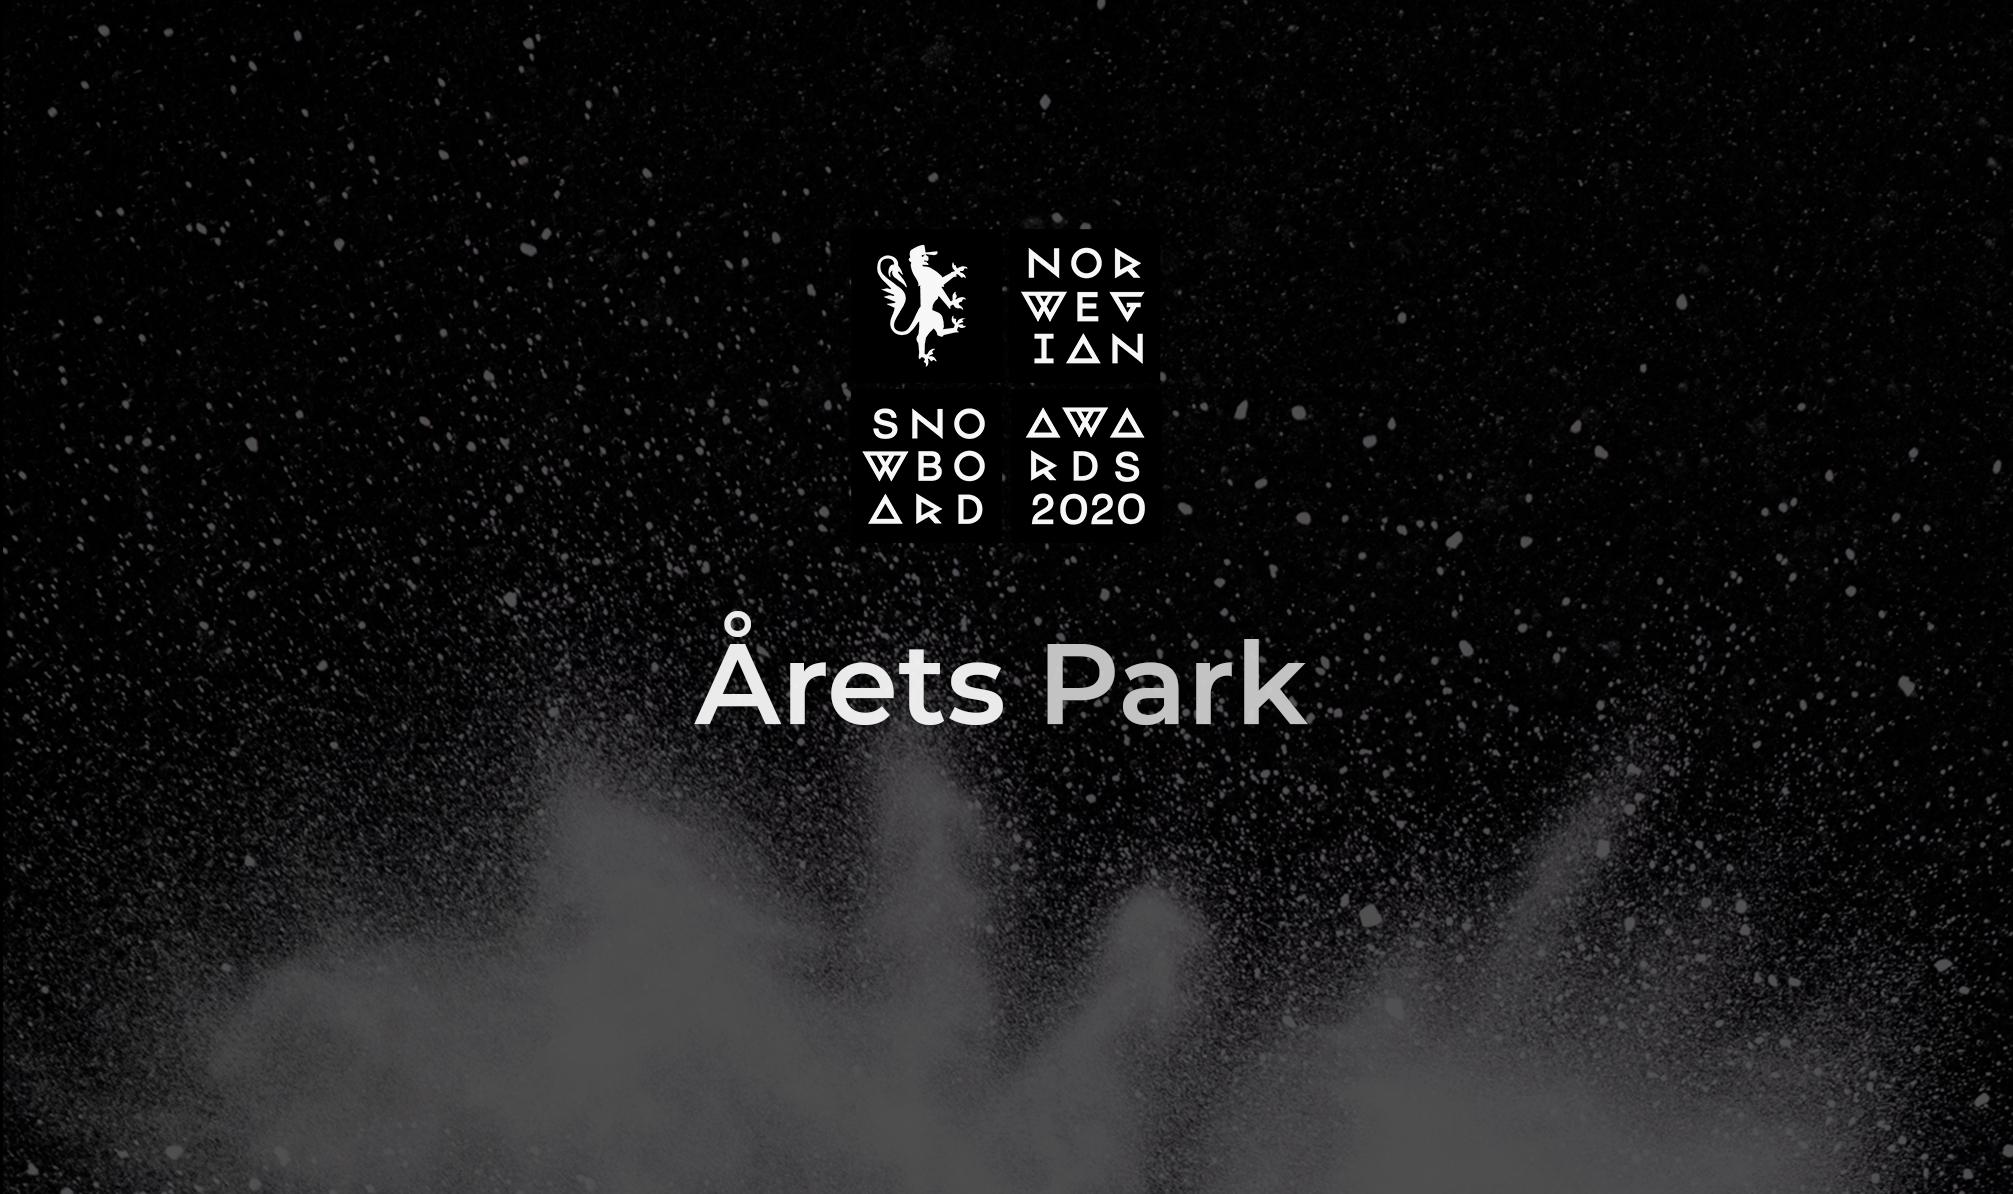 Årets Park